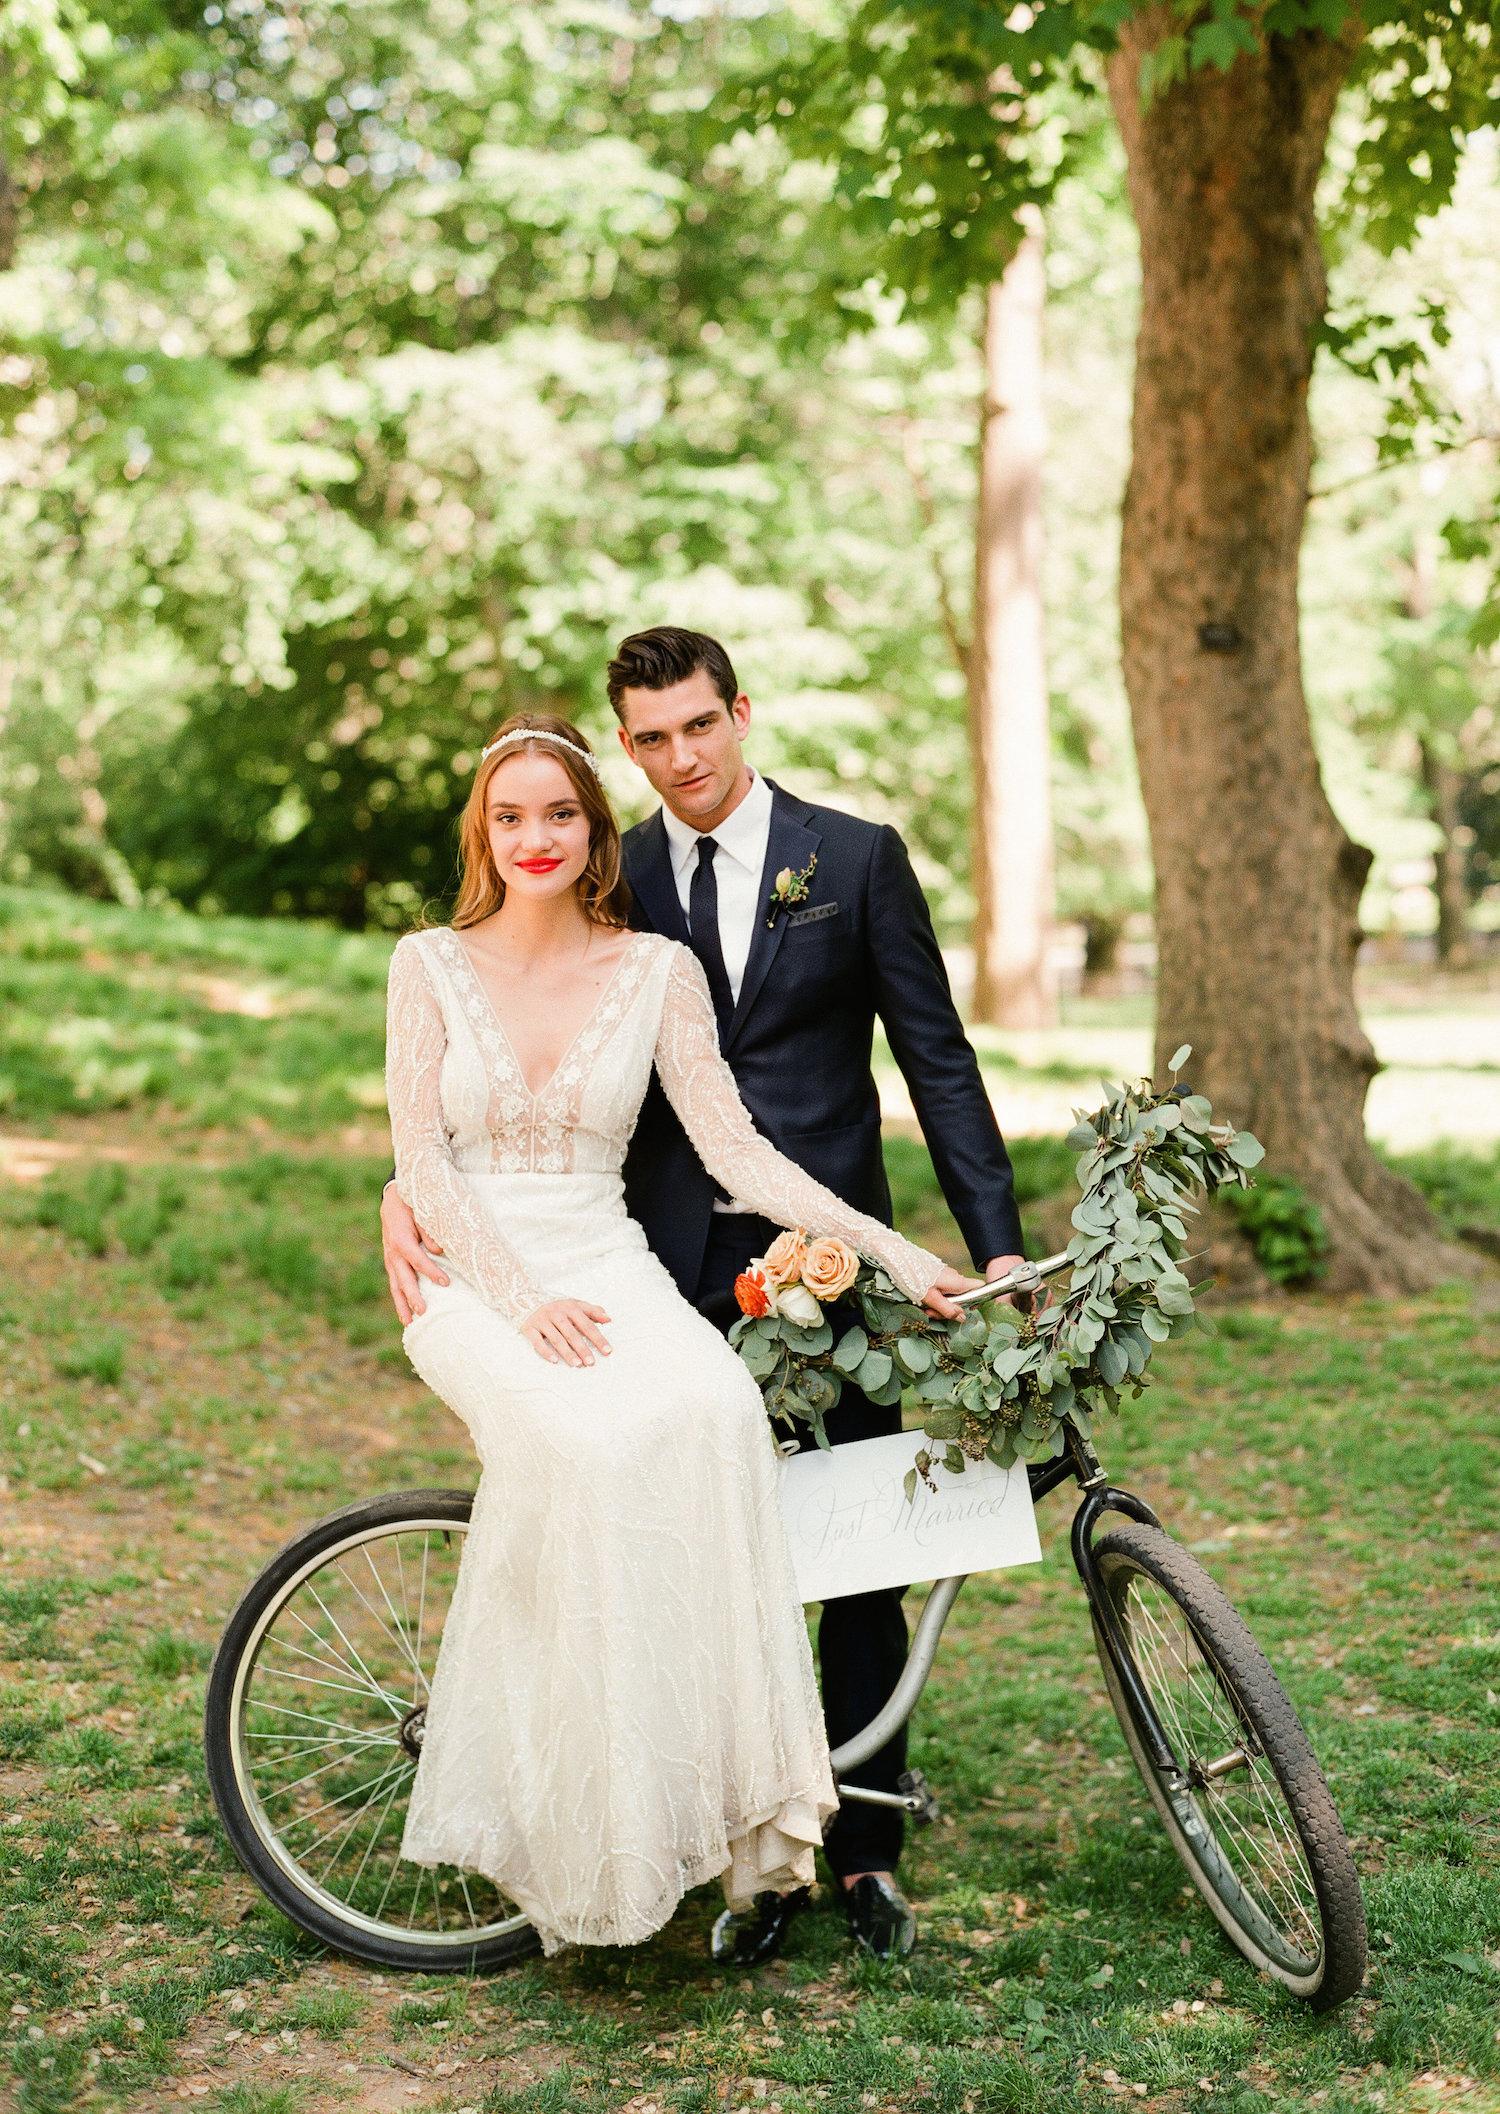 Morning Glow - Full Aperture Floral & Lindsay Madden Photography 123.jpeg